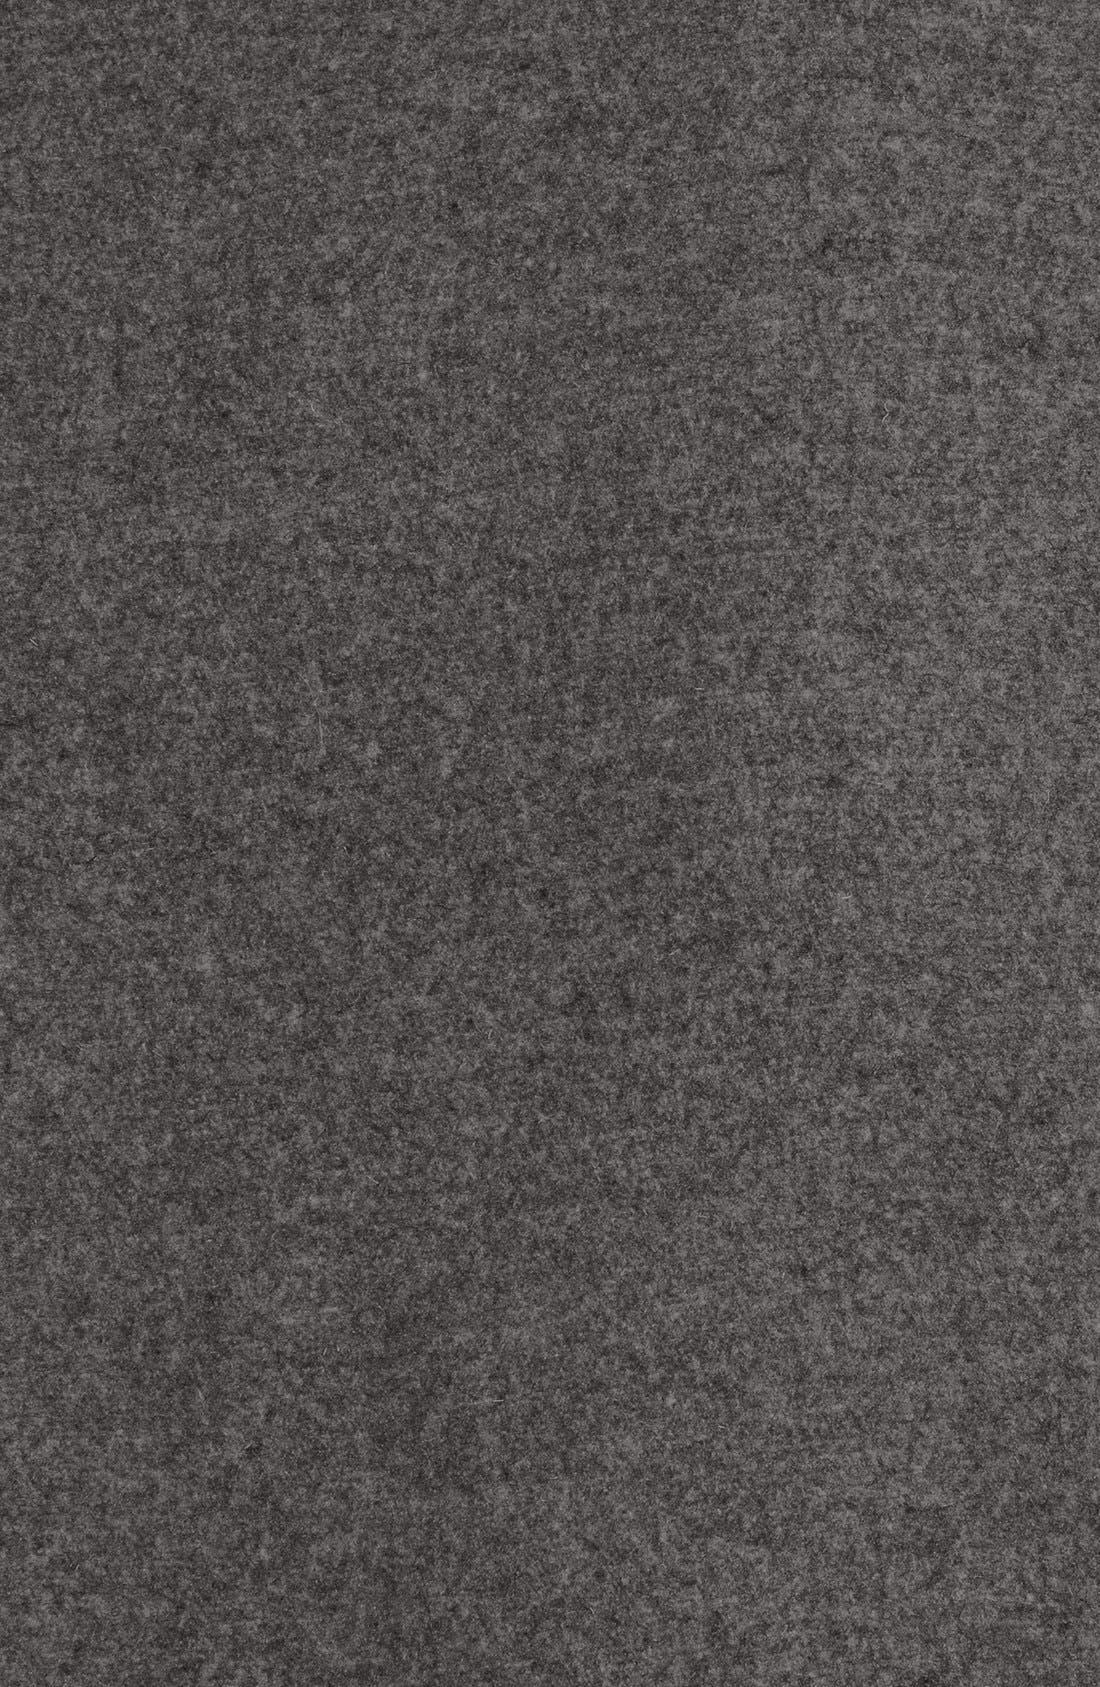 Alternate Image 3  - Spiewak 'Franklin' Wool Blend Jacket